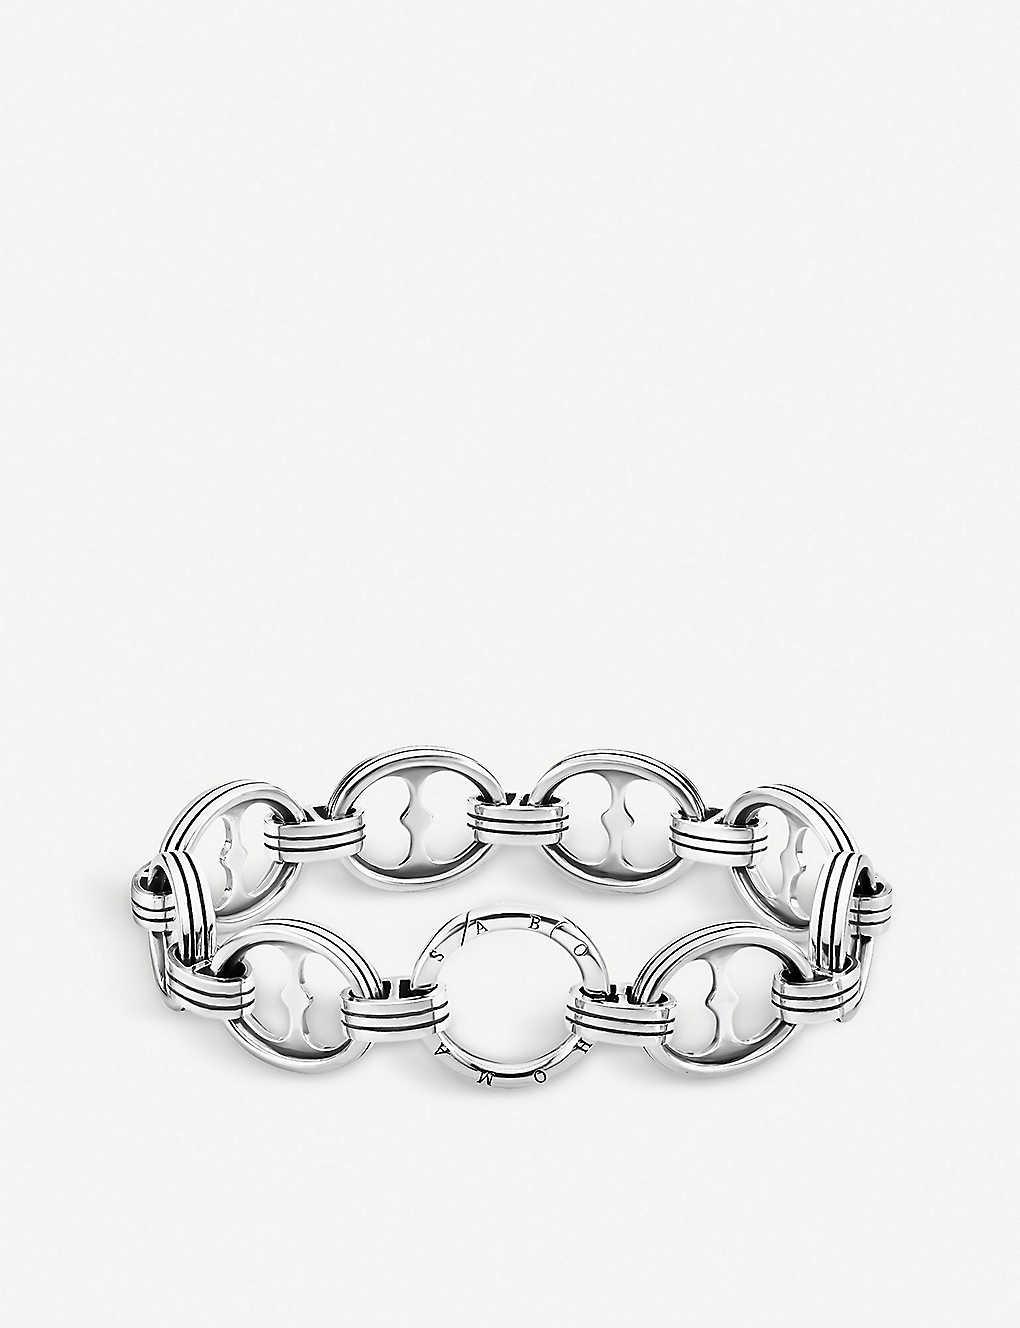 09b2bed61 THOMAS SABO - Rebel at Heart XL chain sterling silver bracelet ...